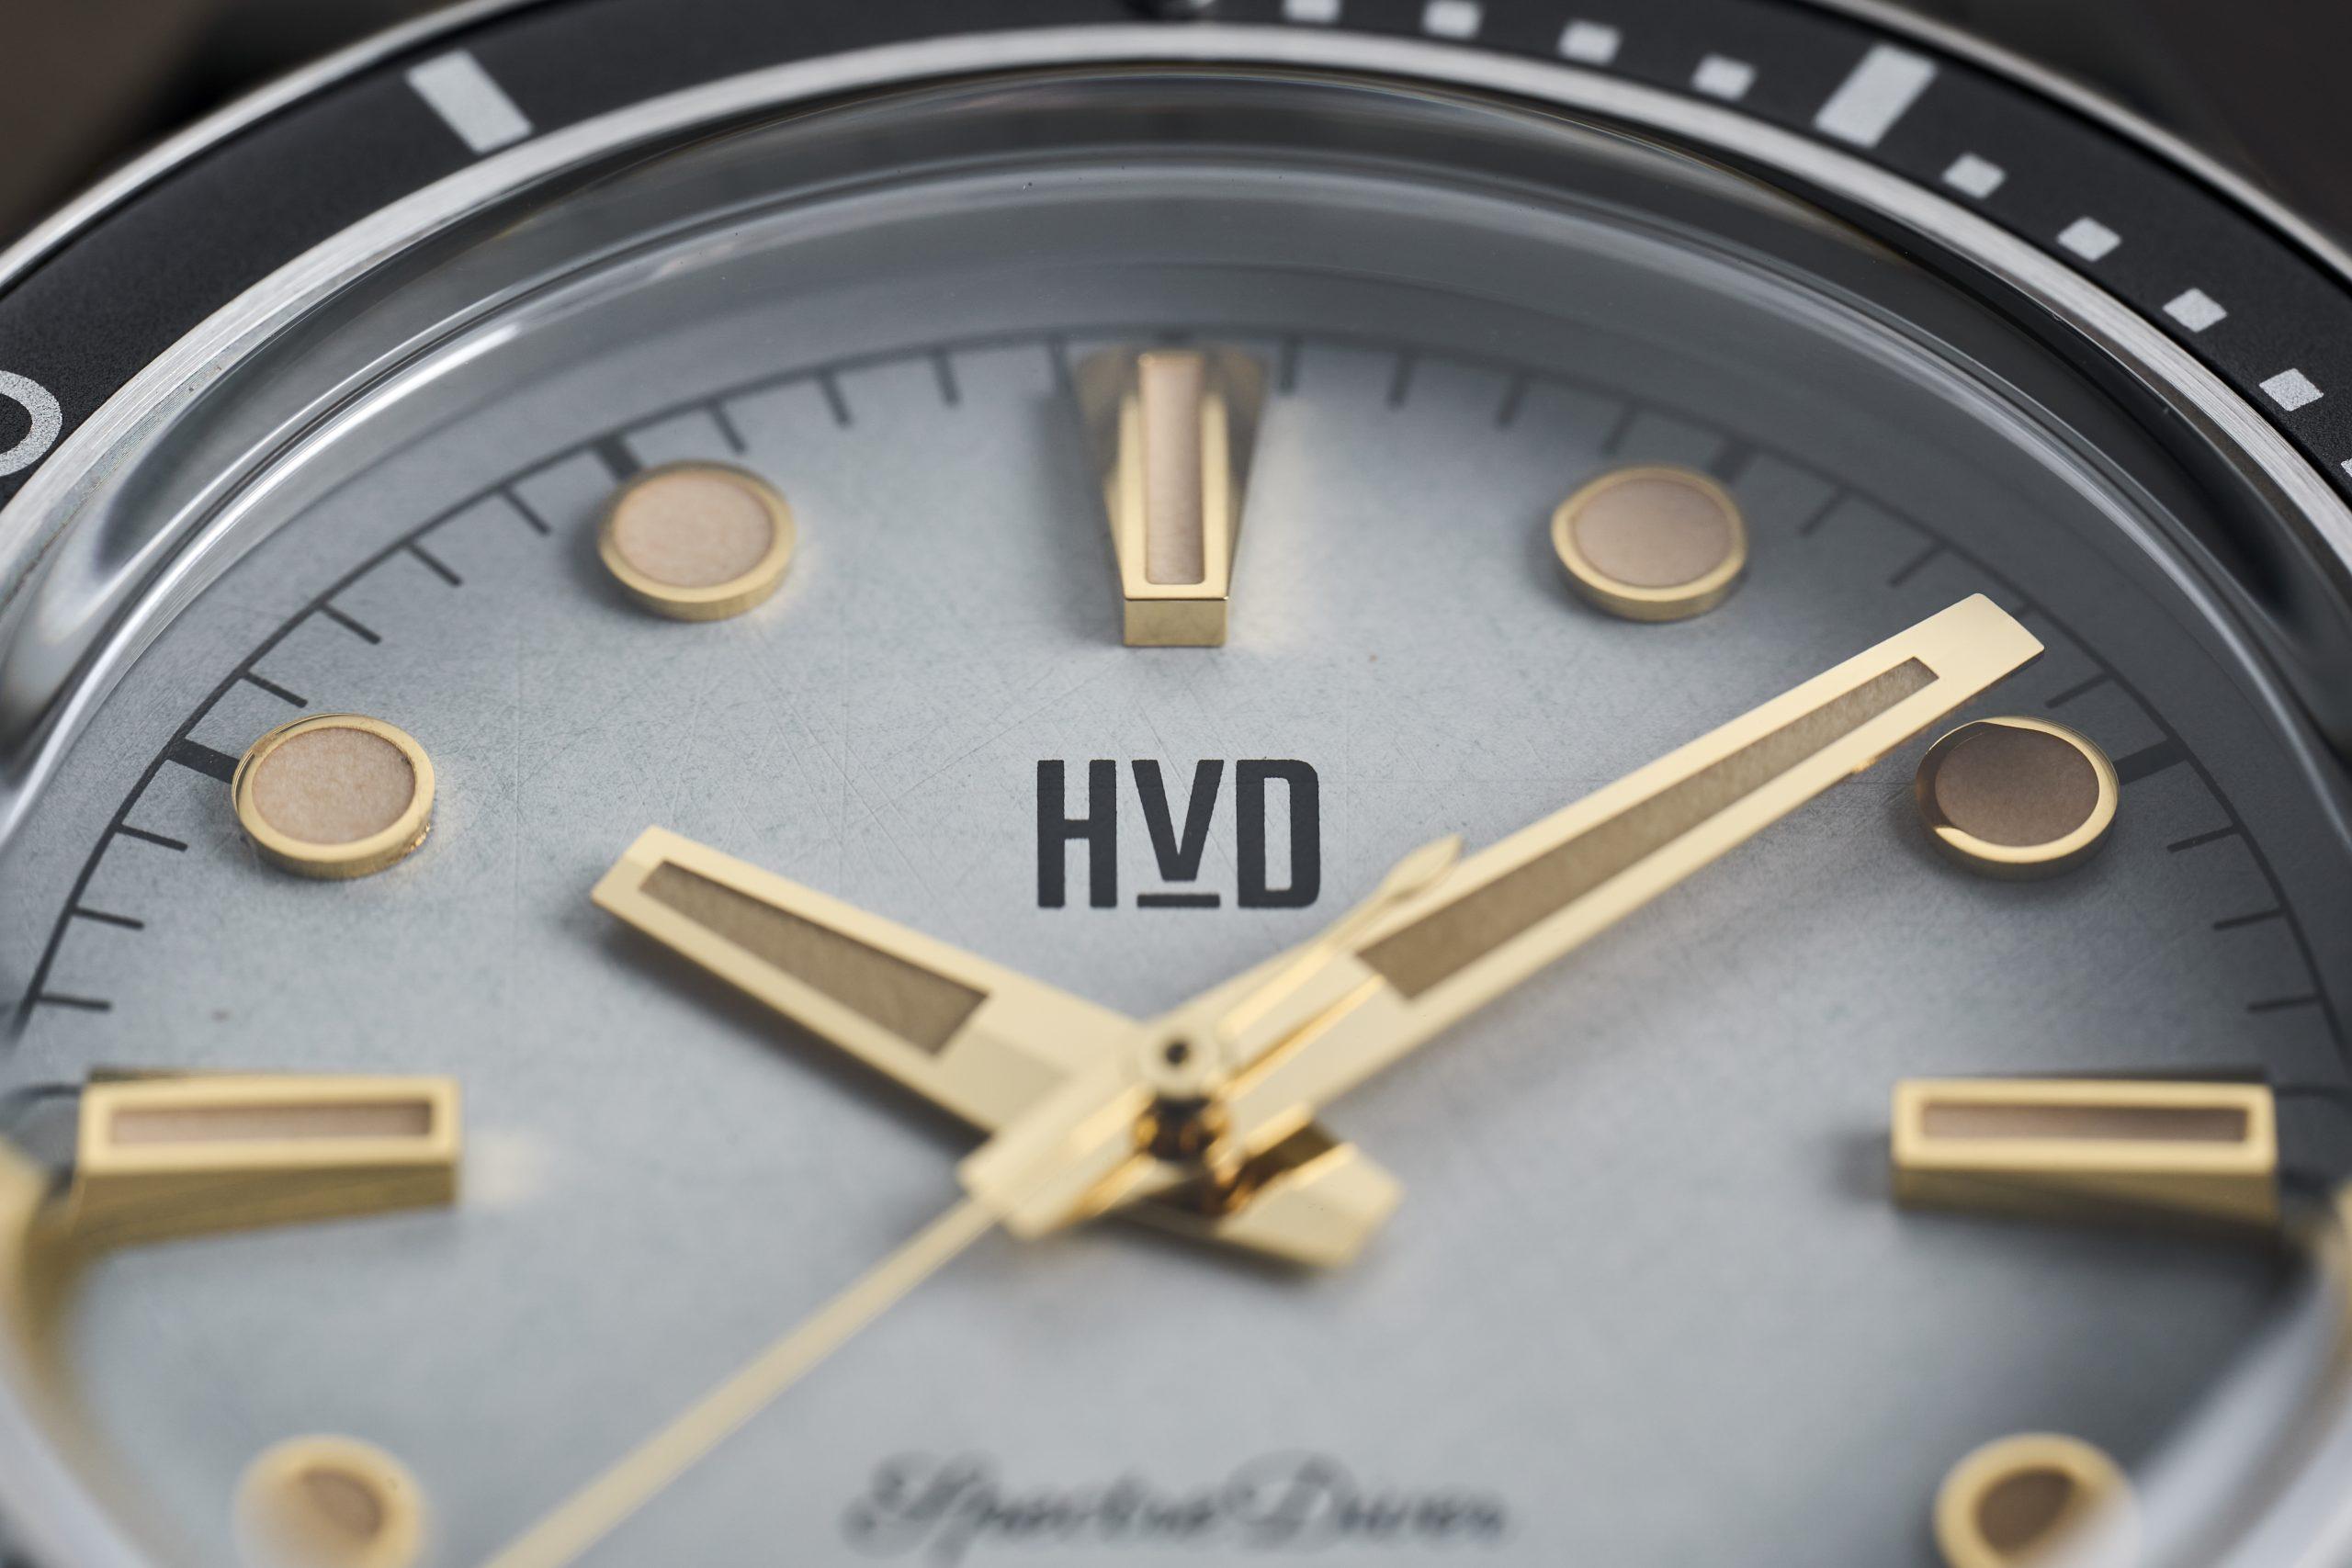 HVD Handwound Vintage Design Spectre Diver Review Moonstone White